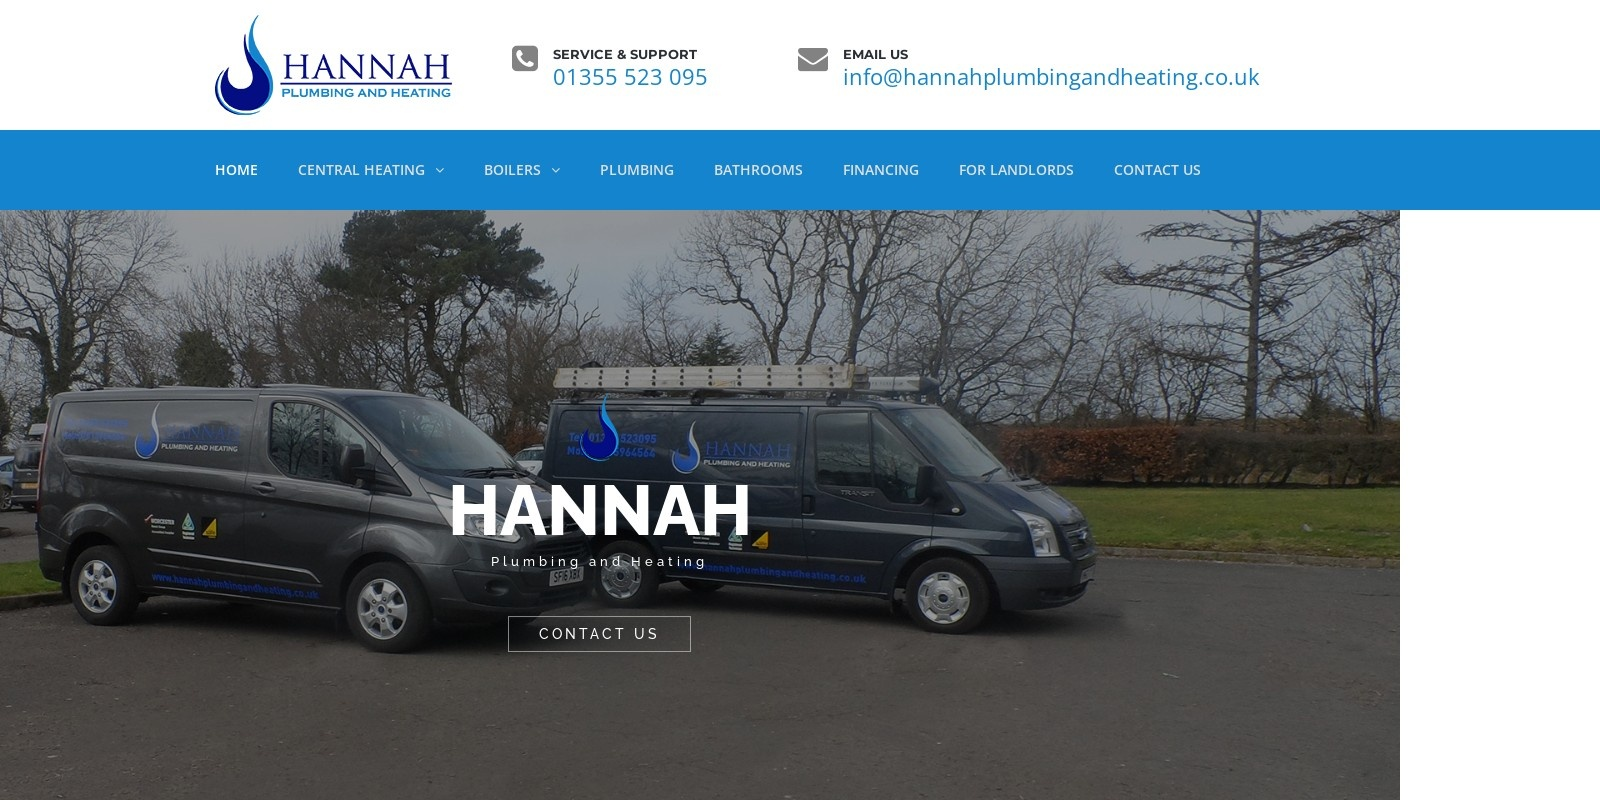 Preview of http://www.hannahplumbingandheating.co.uk